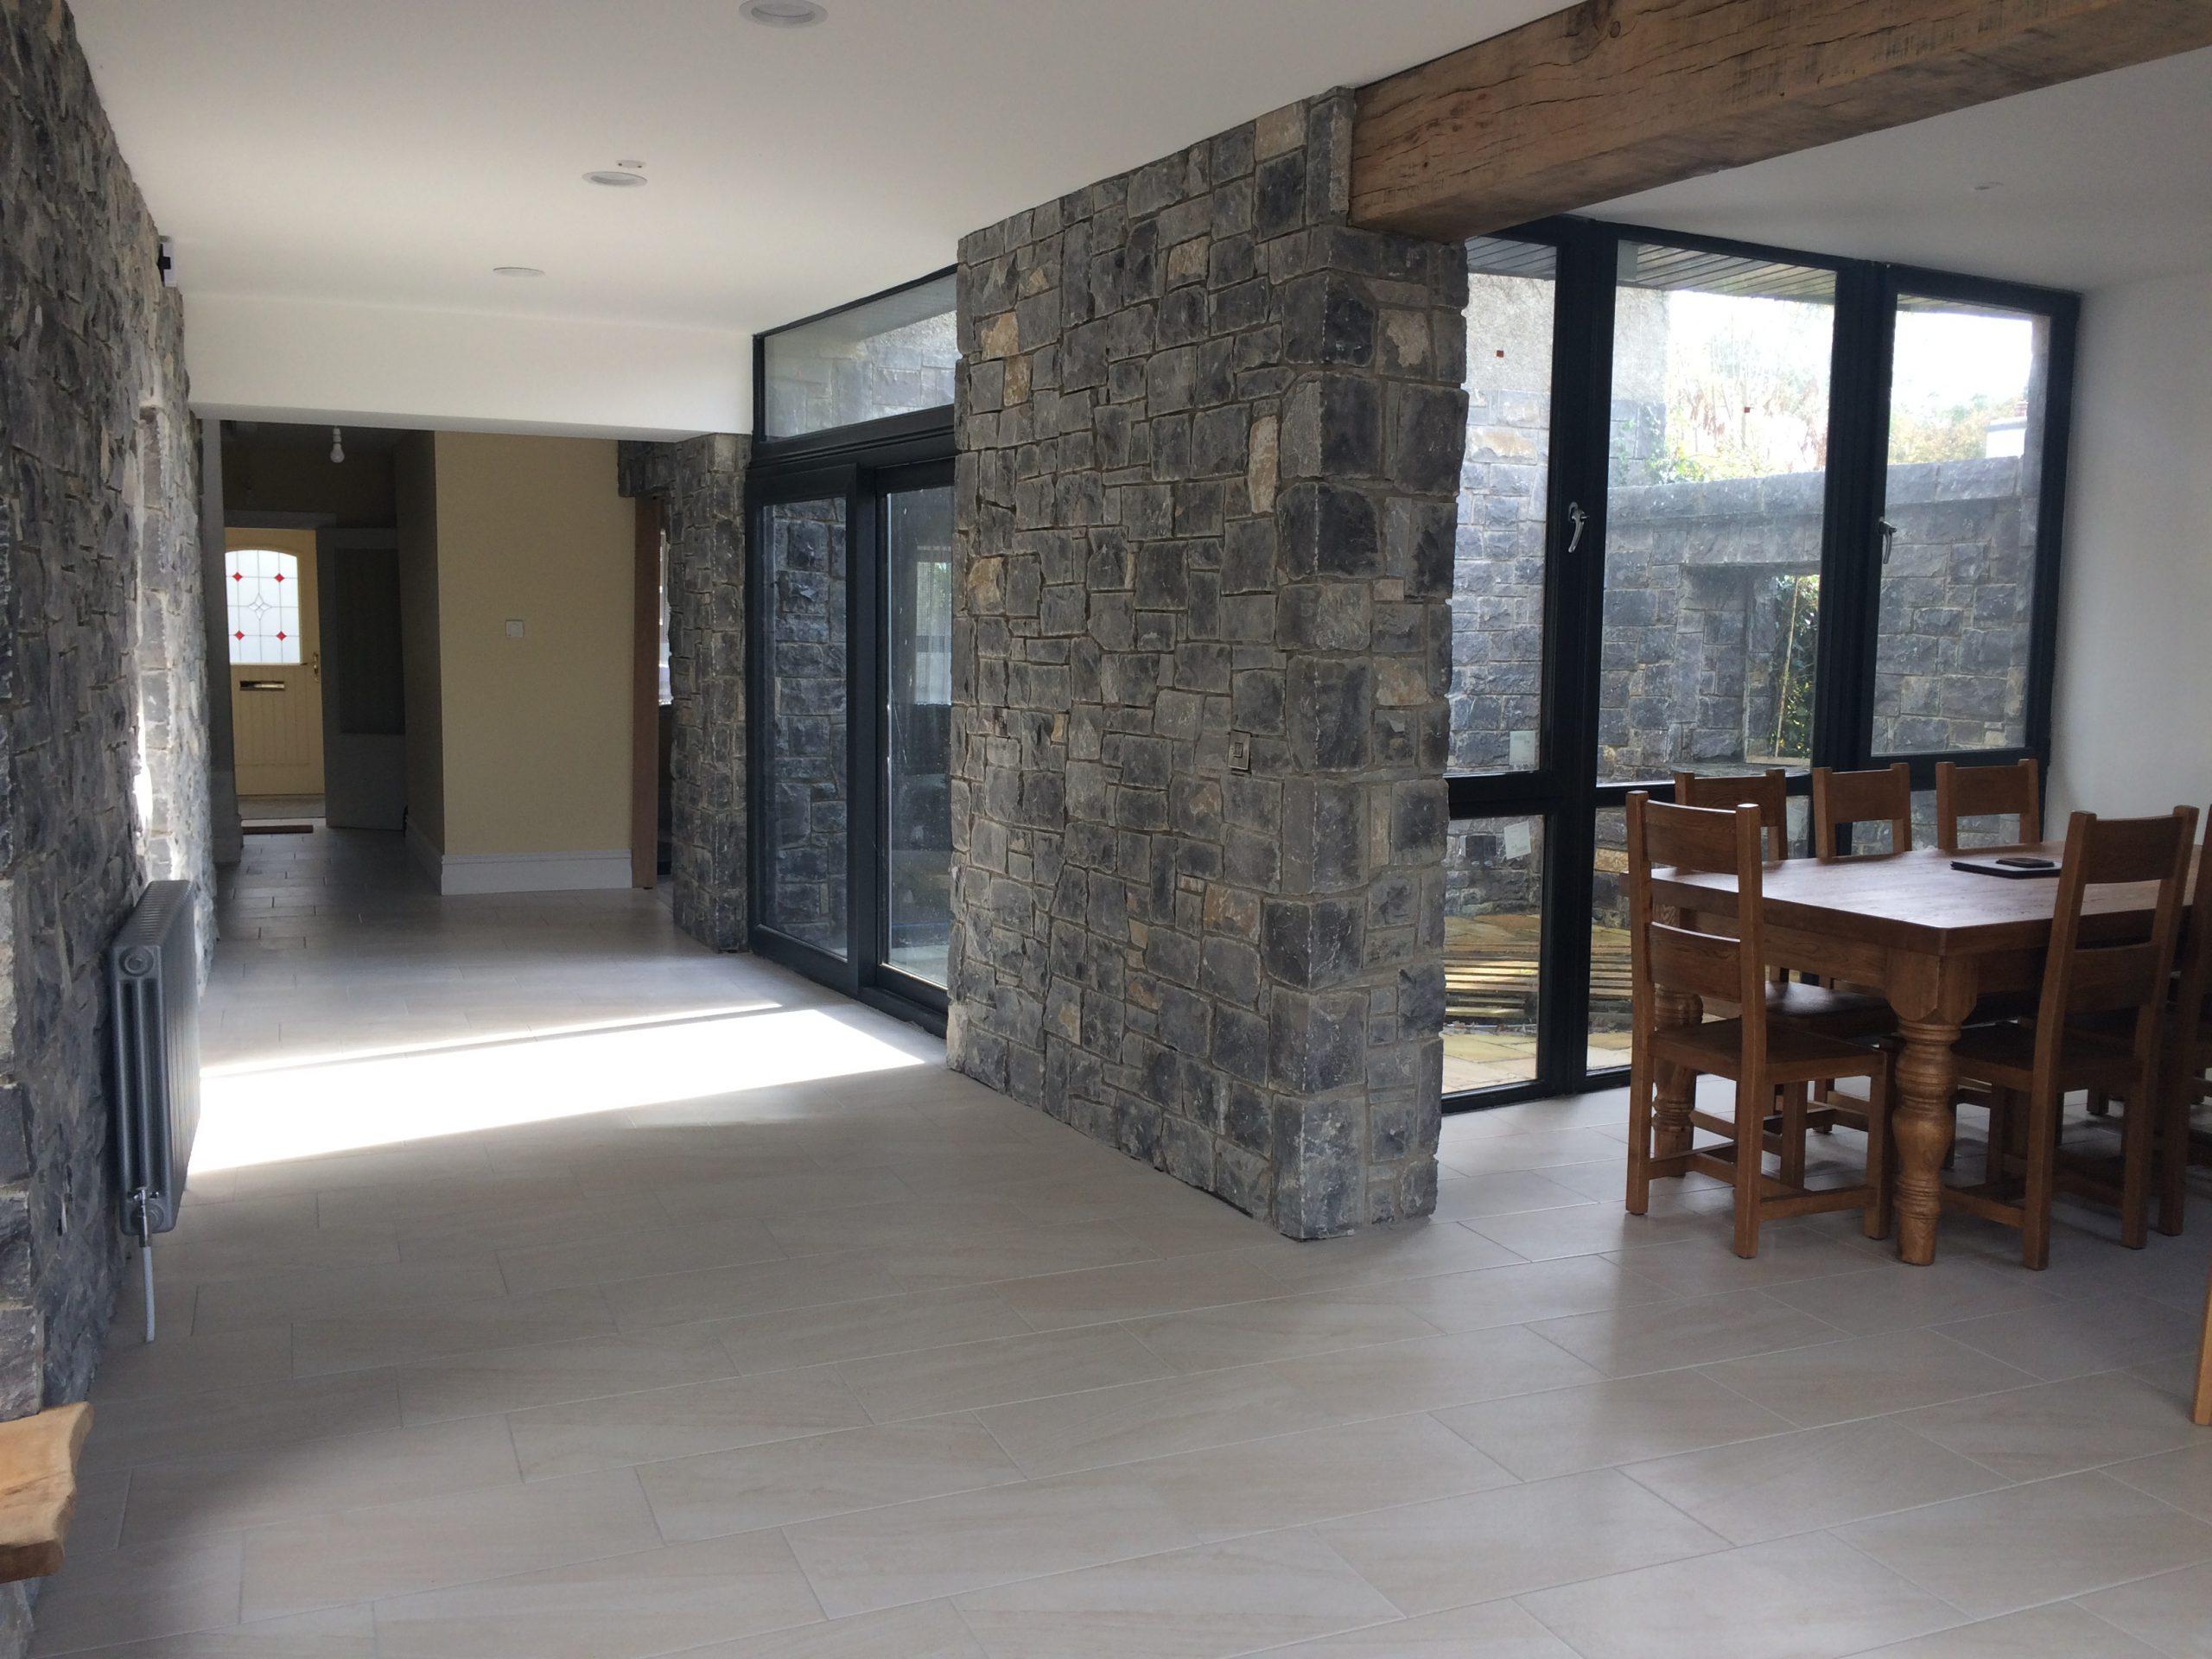 View inside the Heron Brook Lodge - Luxury stays